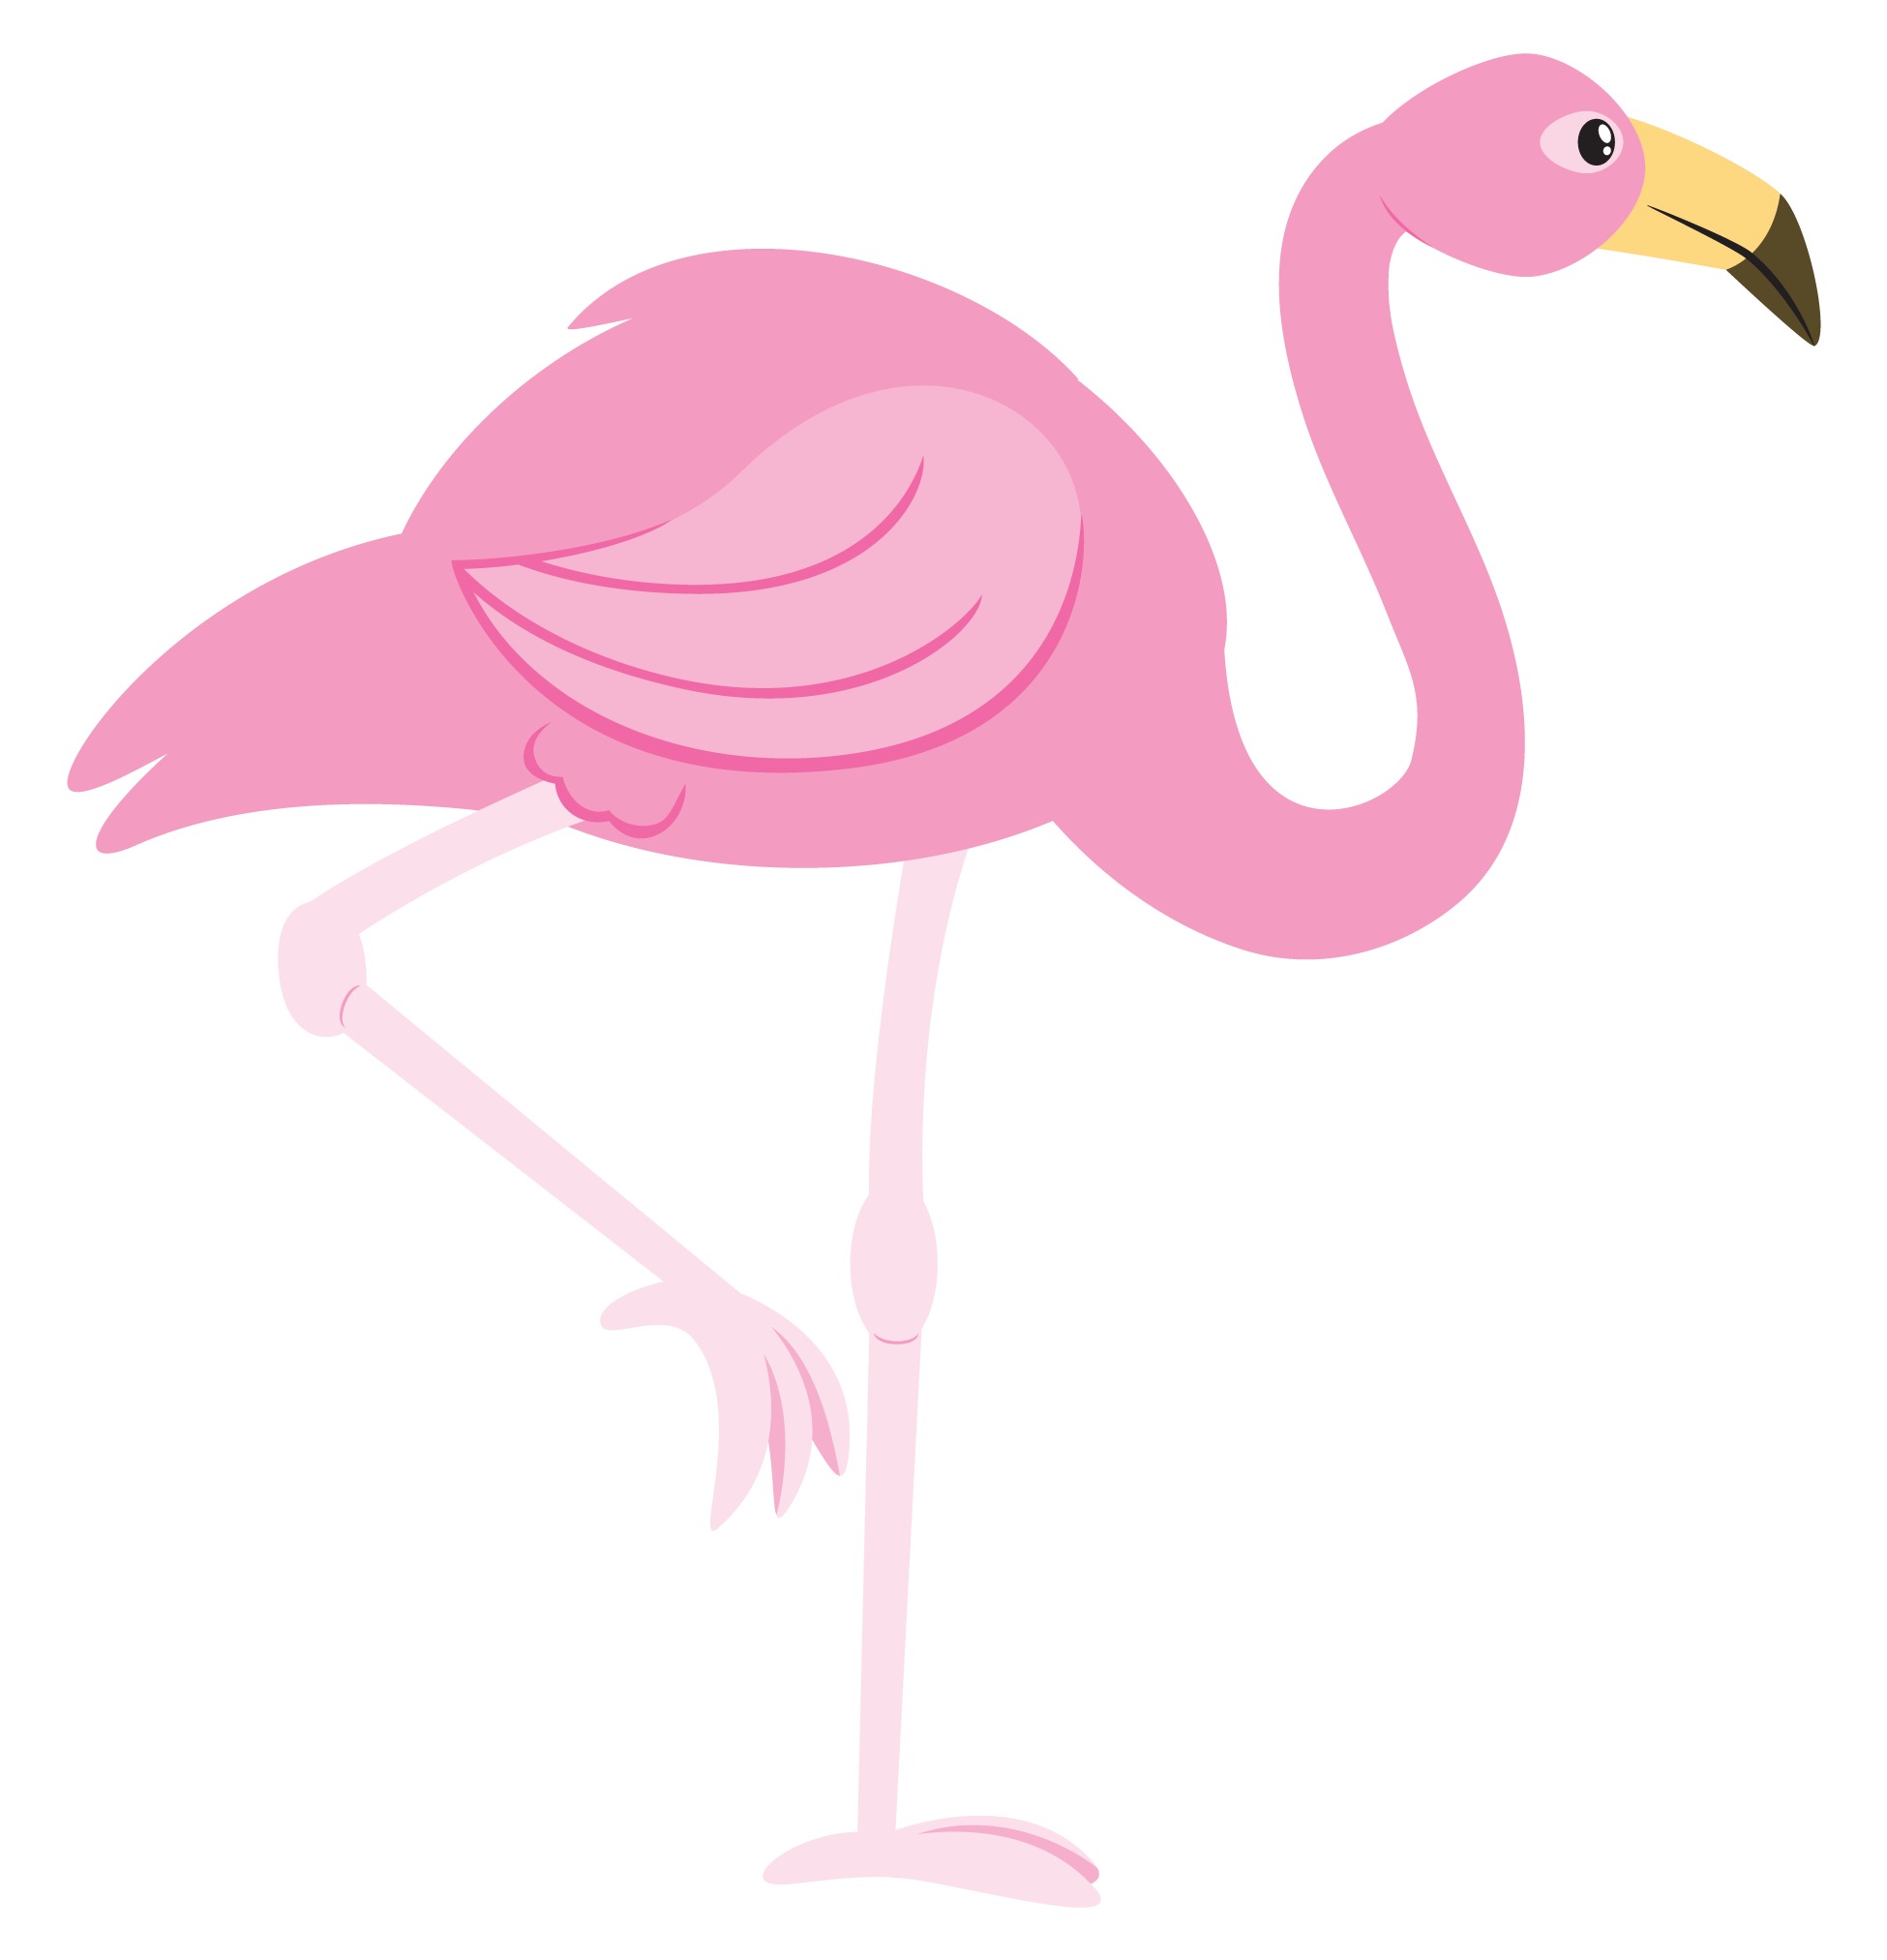 Flamingo clipart #13, Download drawings